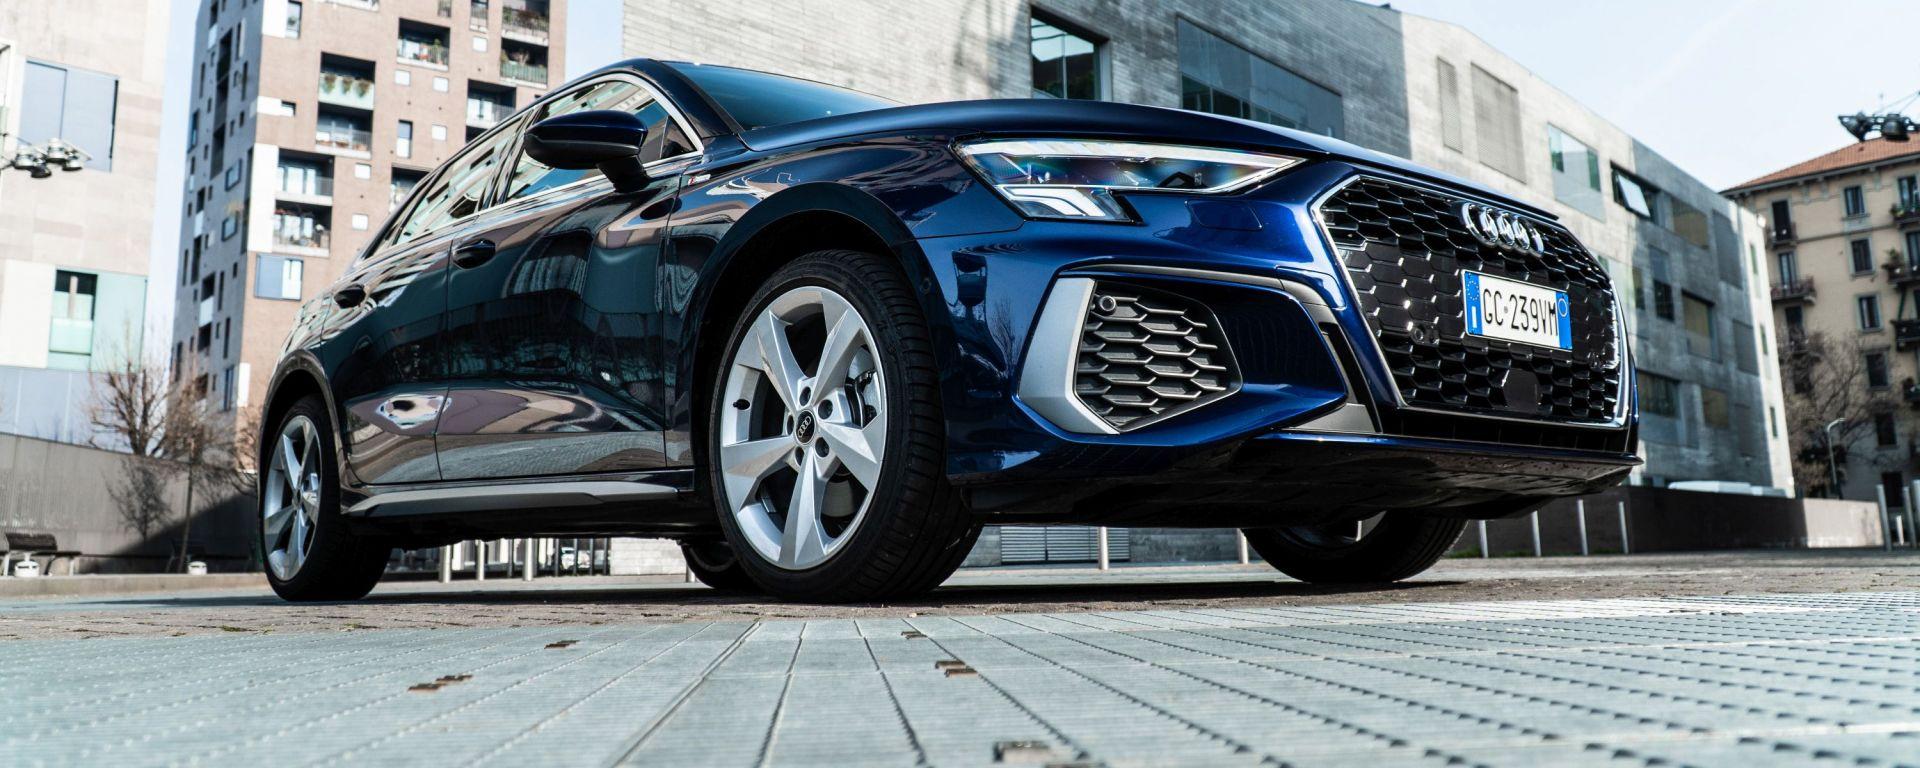 Audi A3 Sportback 30 g-tron: la nuova berlina premium a metano